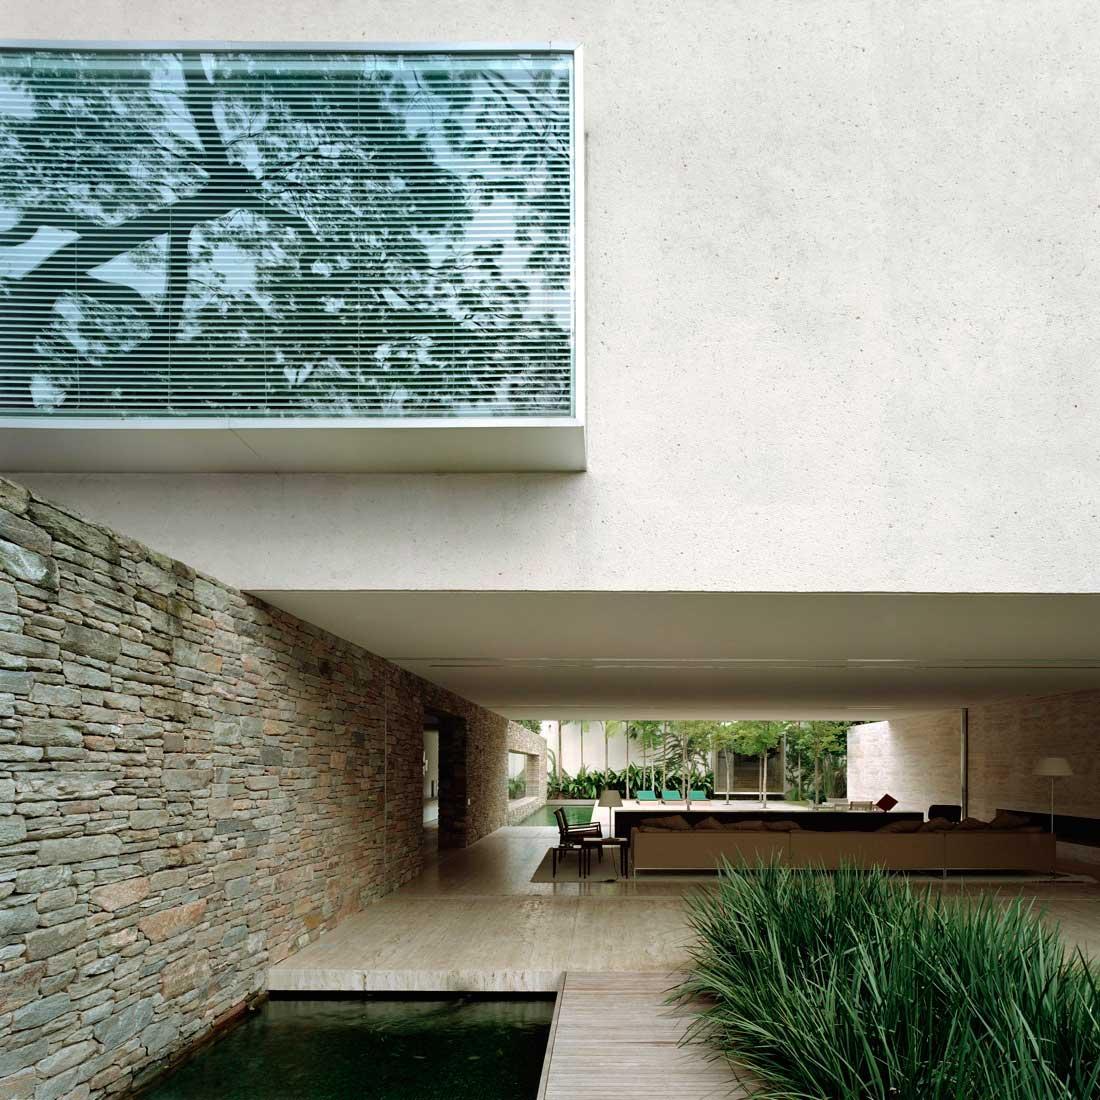 Mirindaba House by Marcio Kogan | Yellowtrace